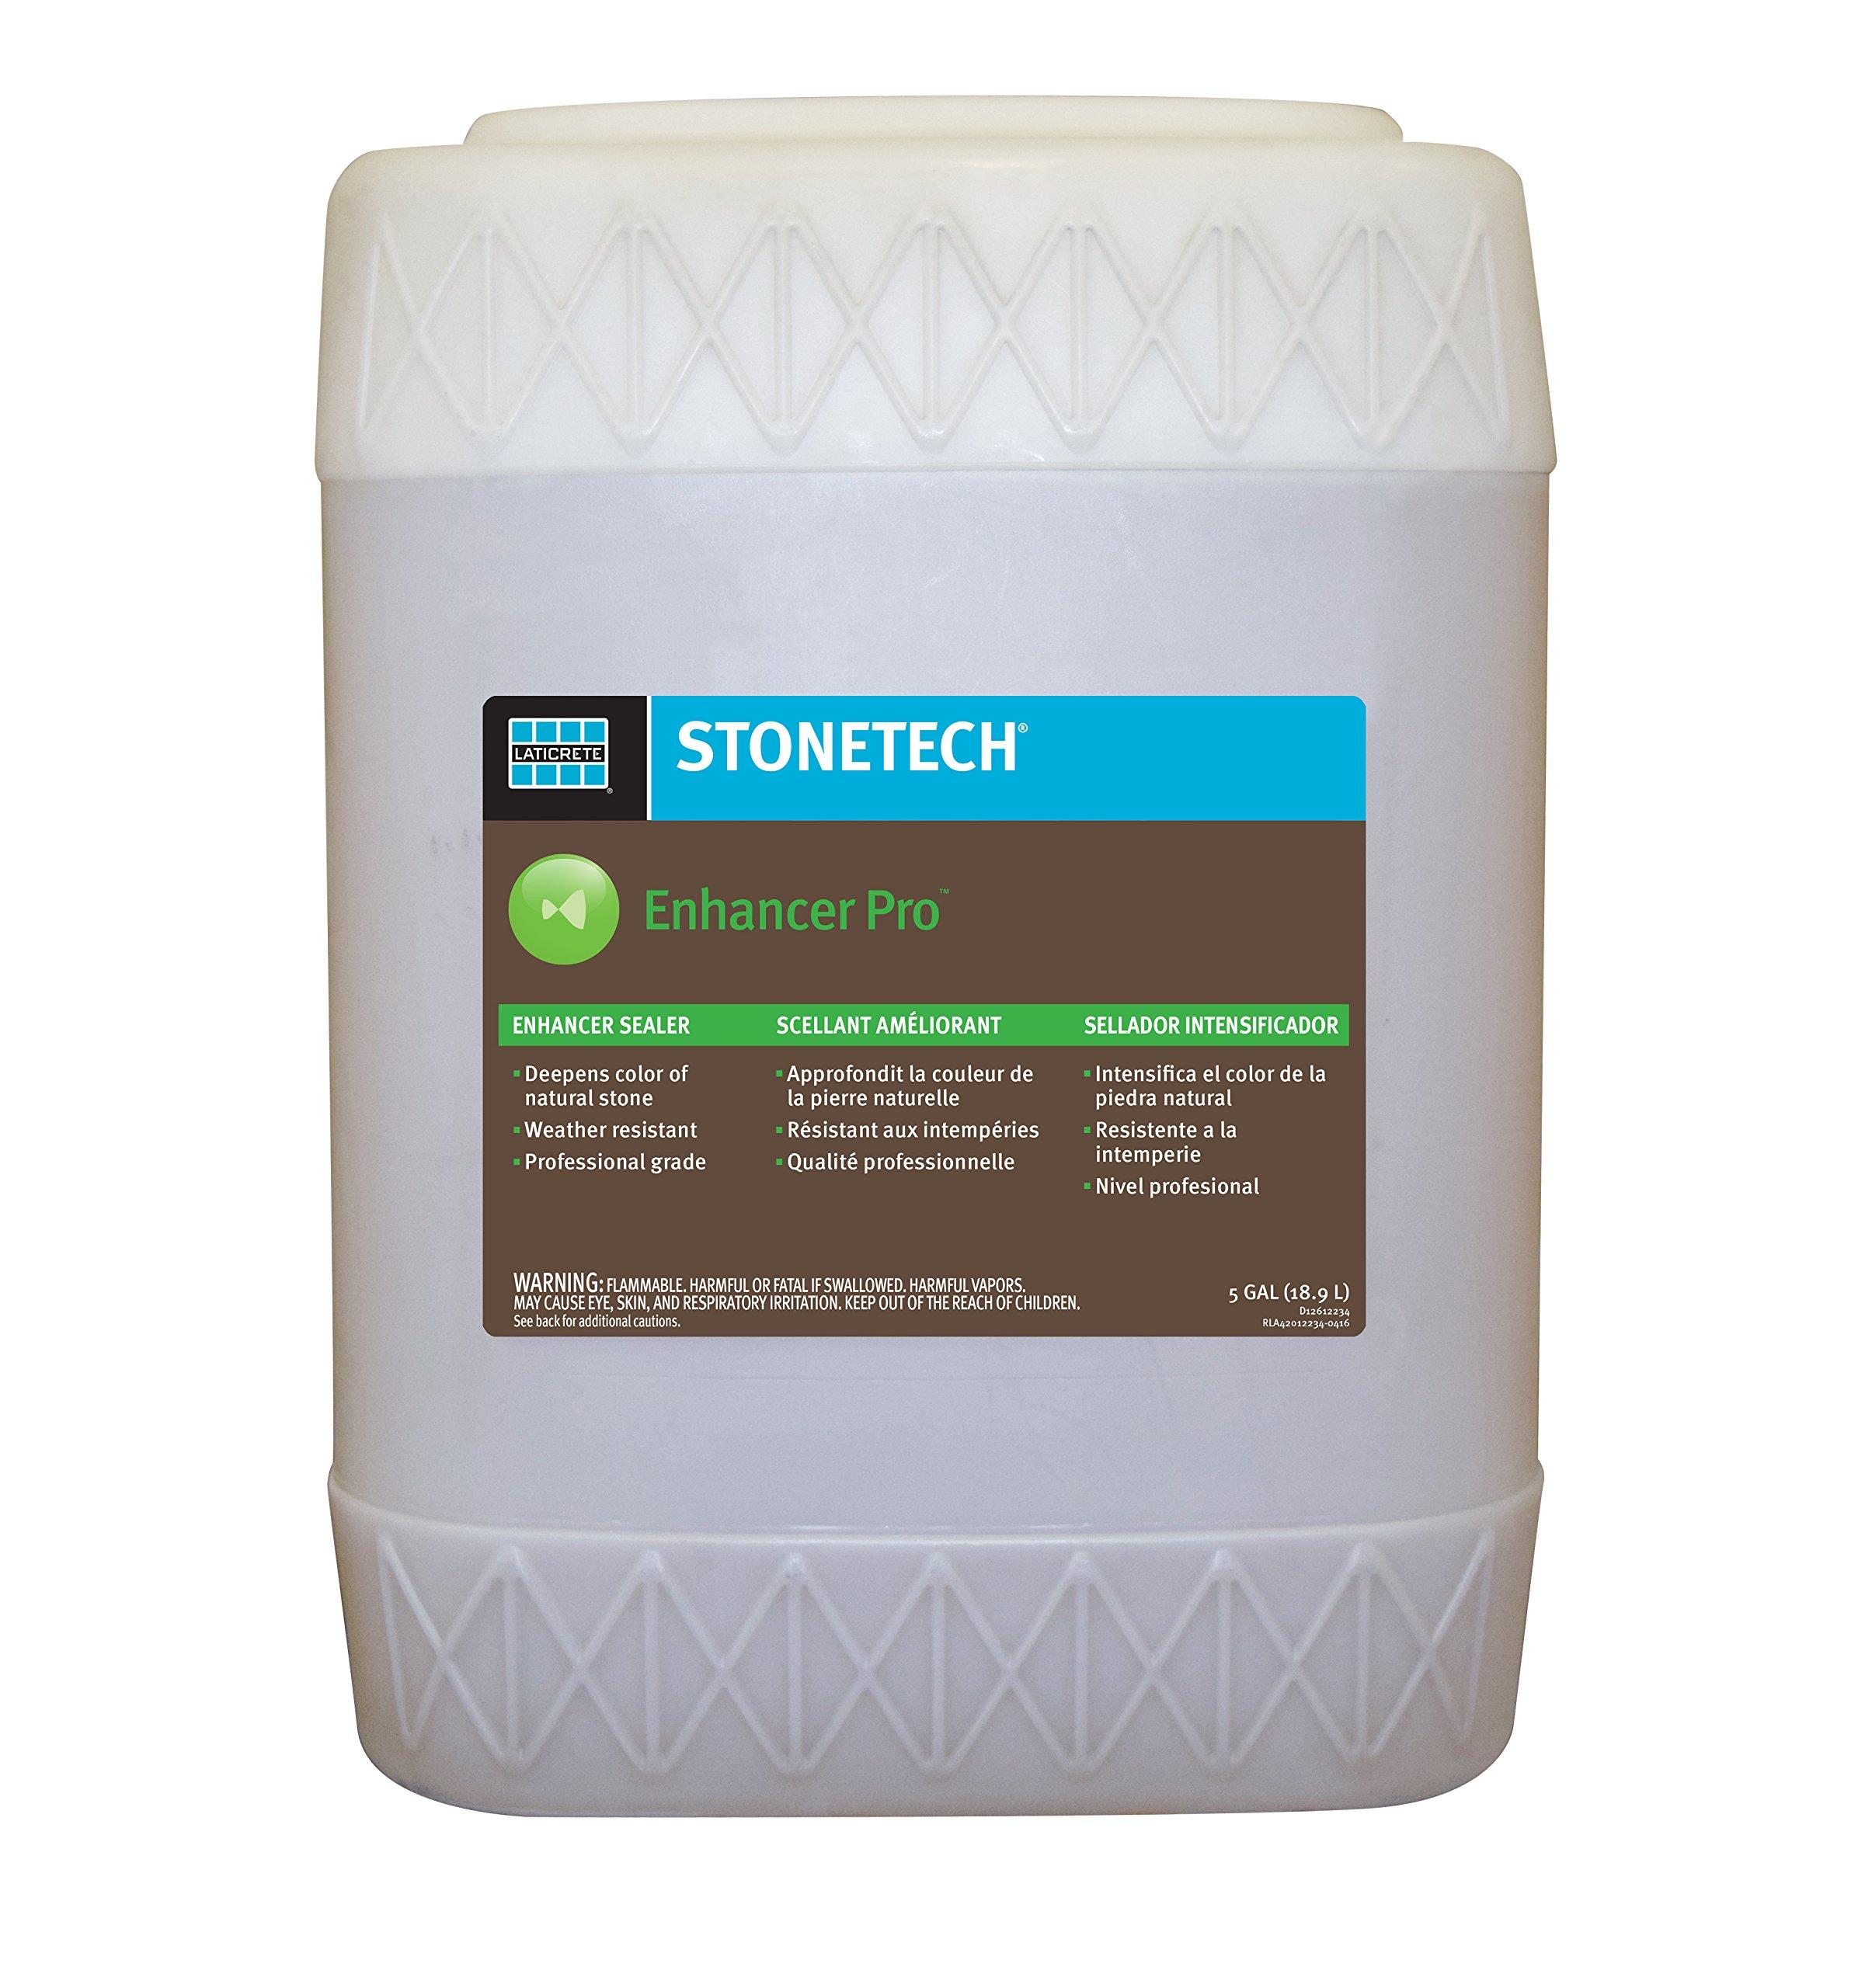 Laticrete Stonetech Enhancer Pro Sealer - 5 Gallon by Laticrete Stonetech